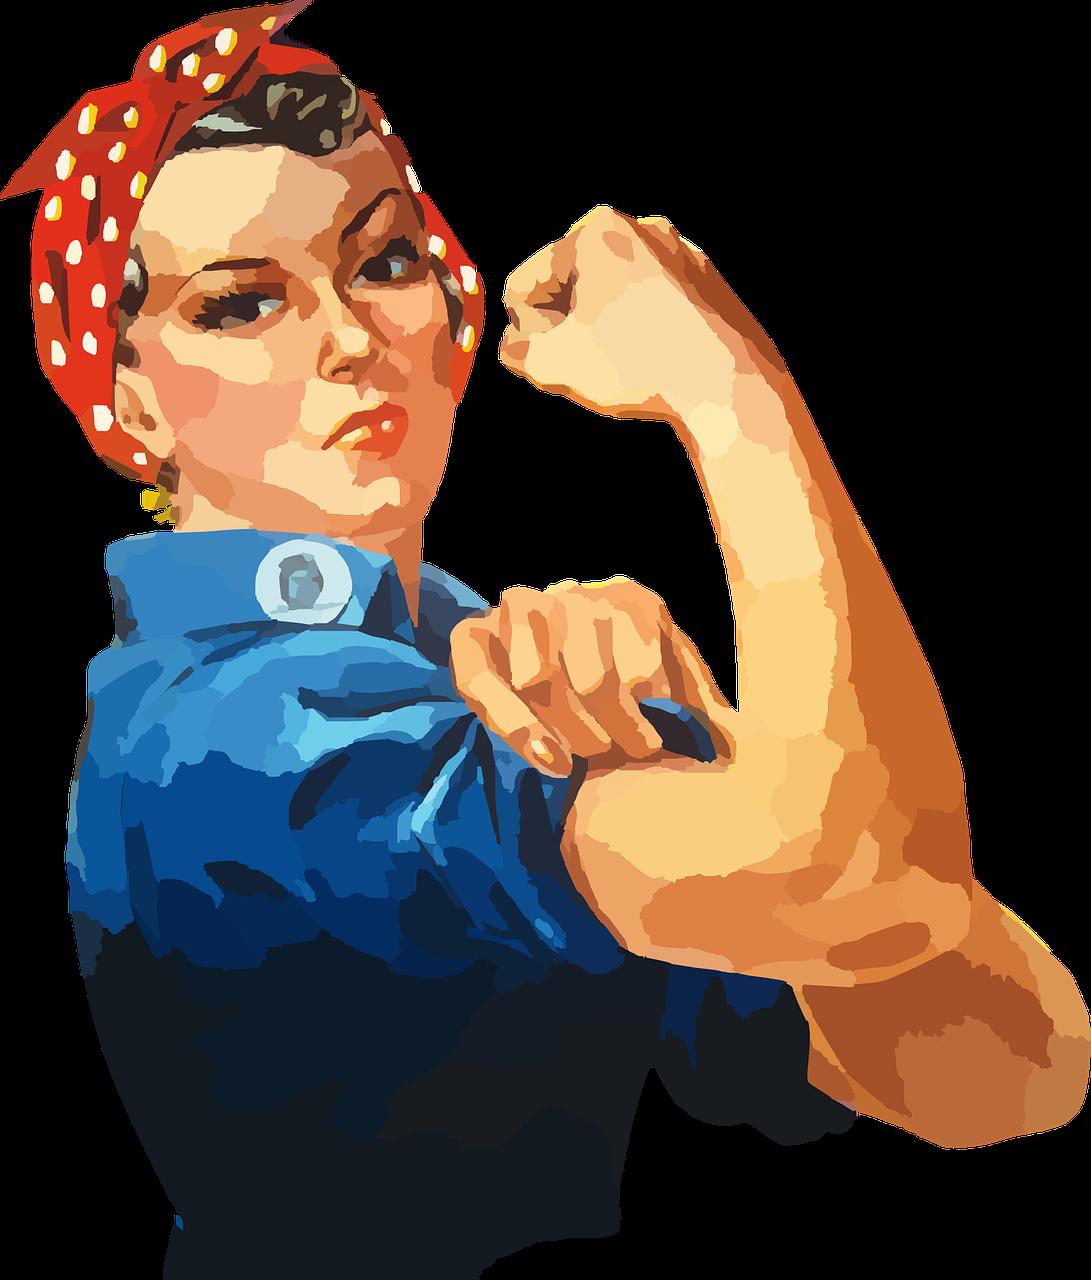 Free Confident Woman Cliparts, Download Free Clip Art, Free Clip Art.